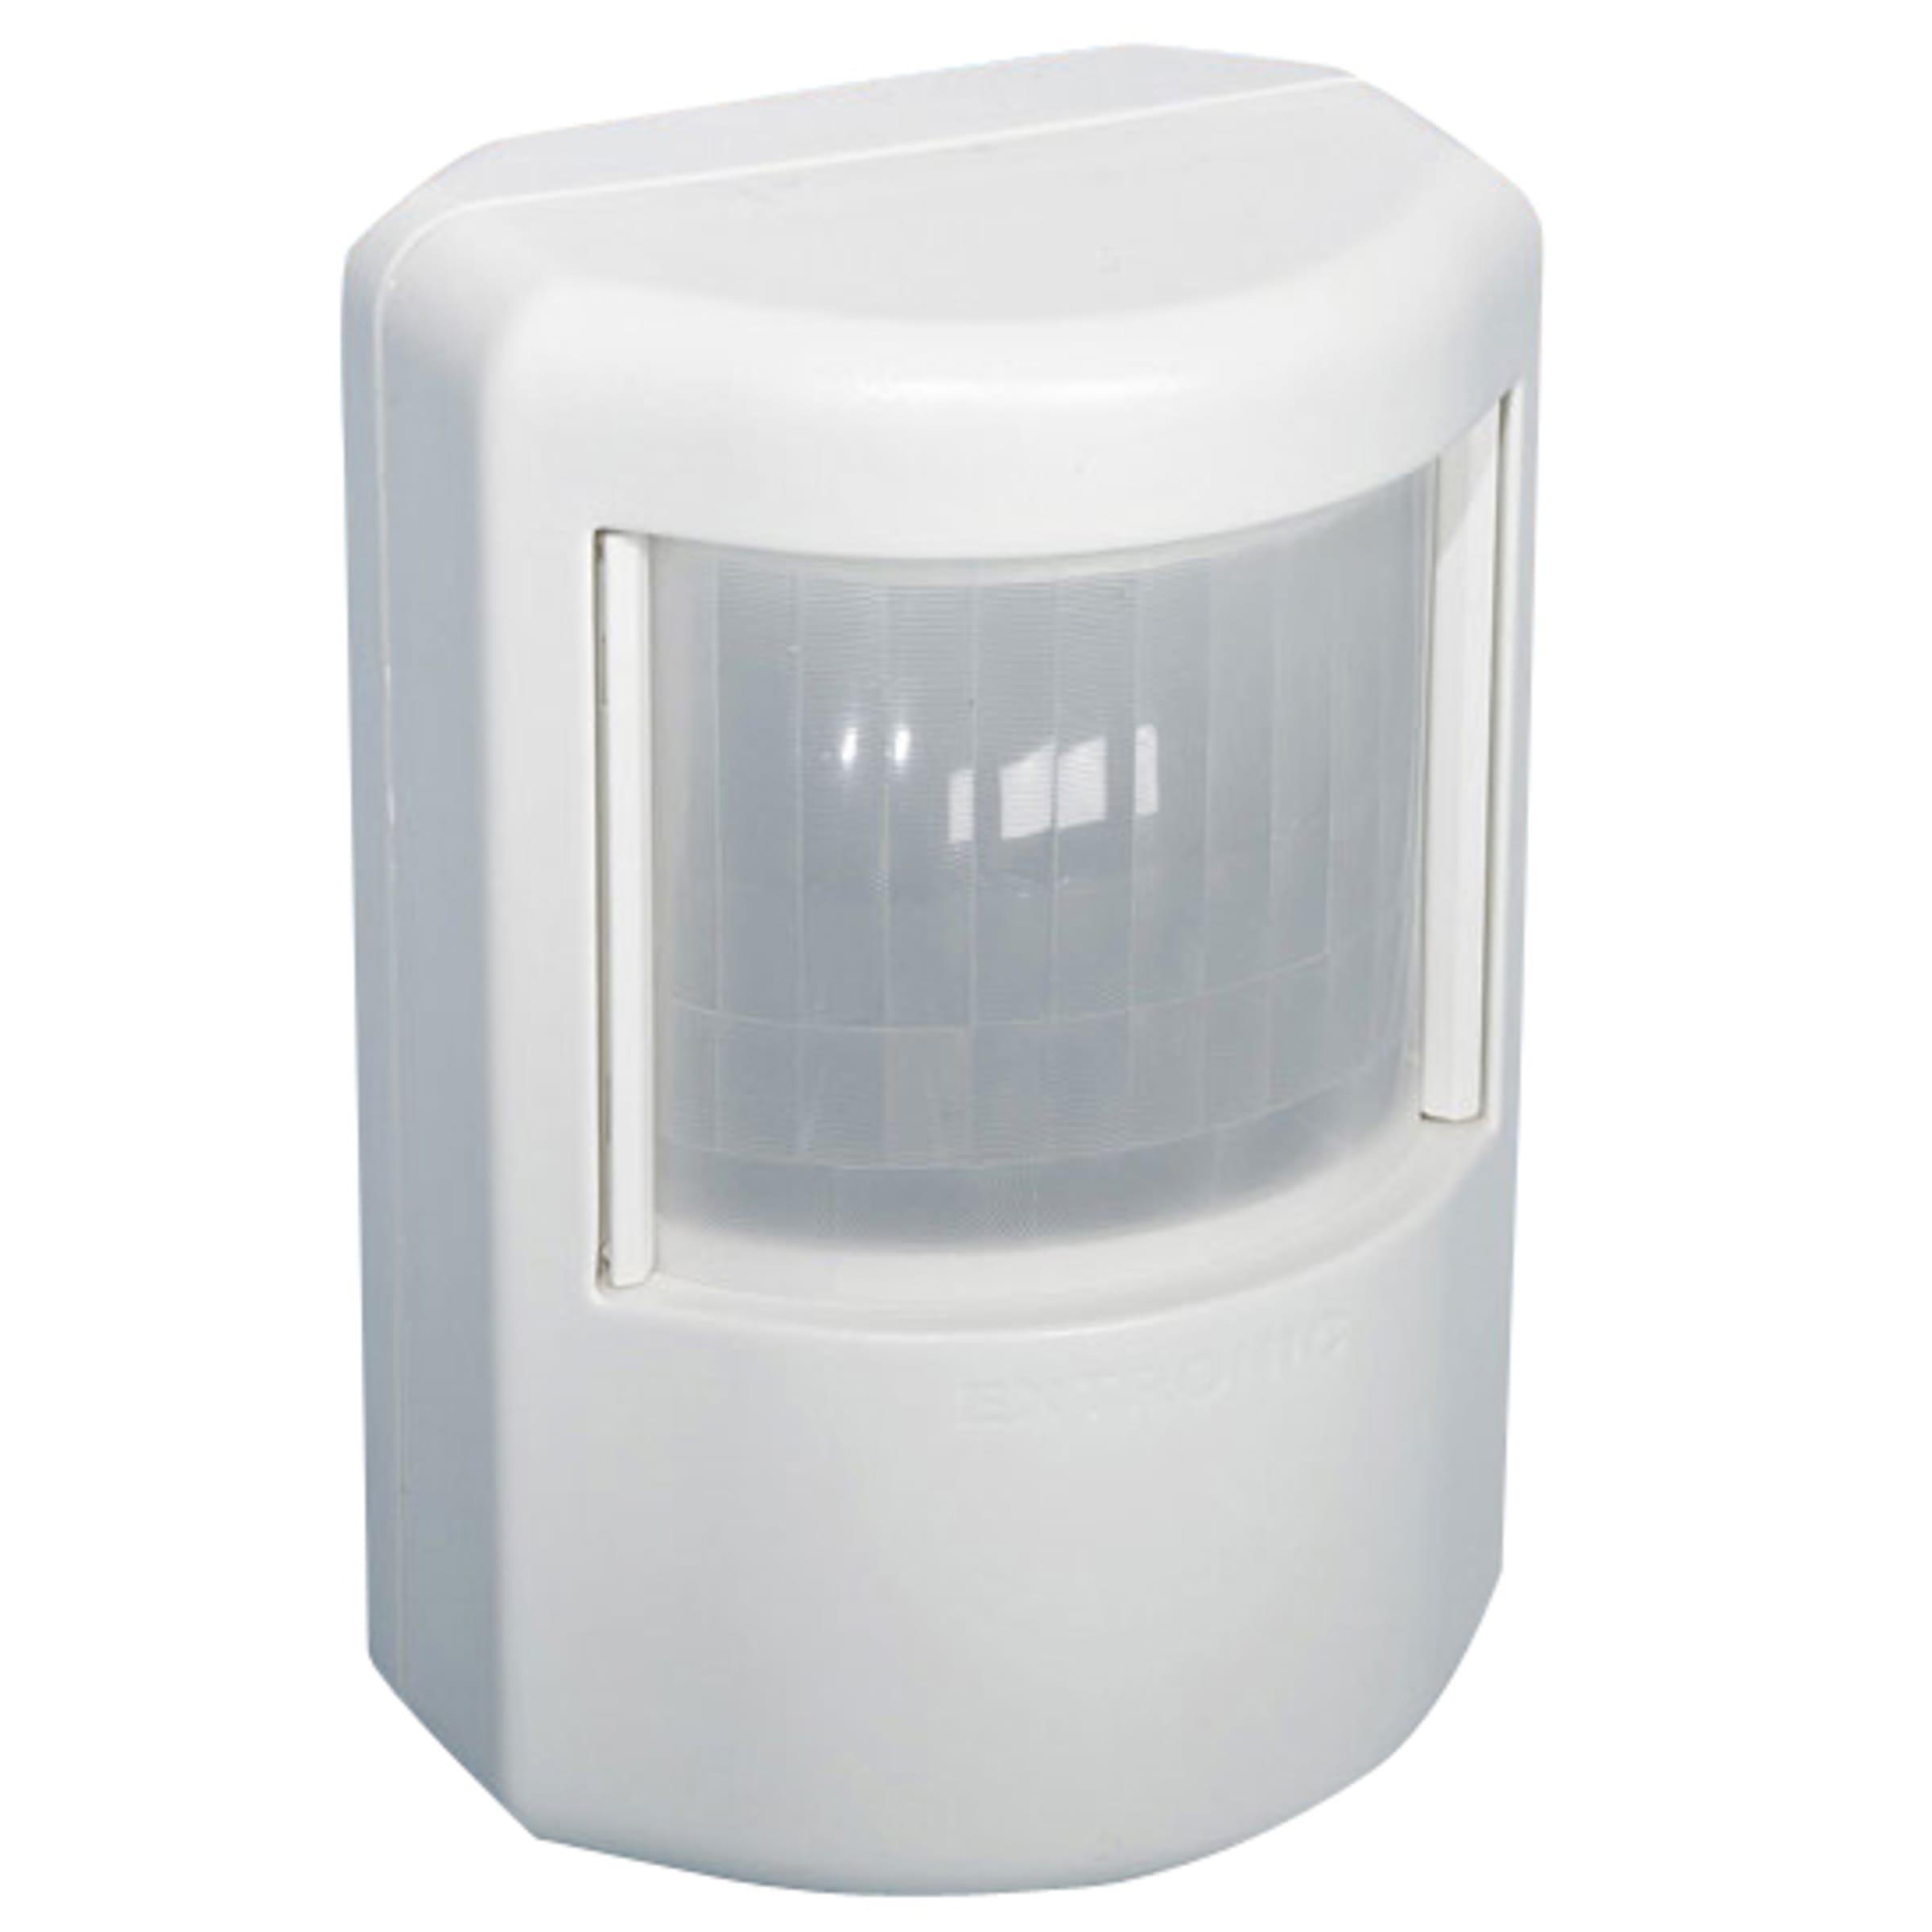 PIR 12V White, with sensor